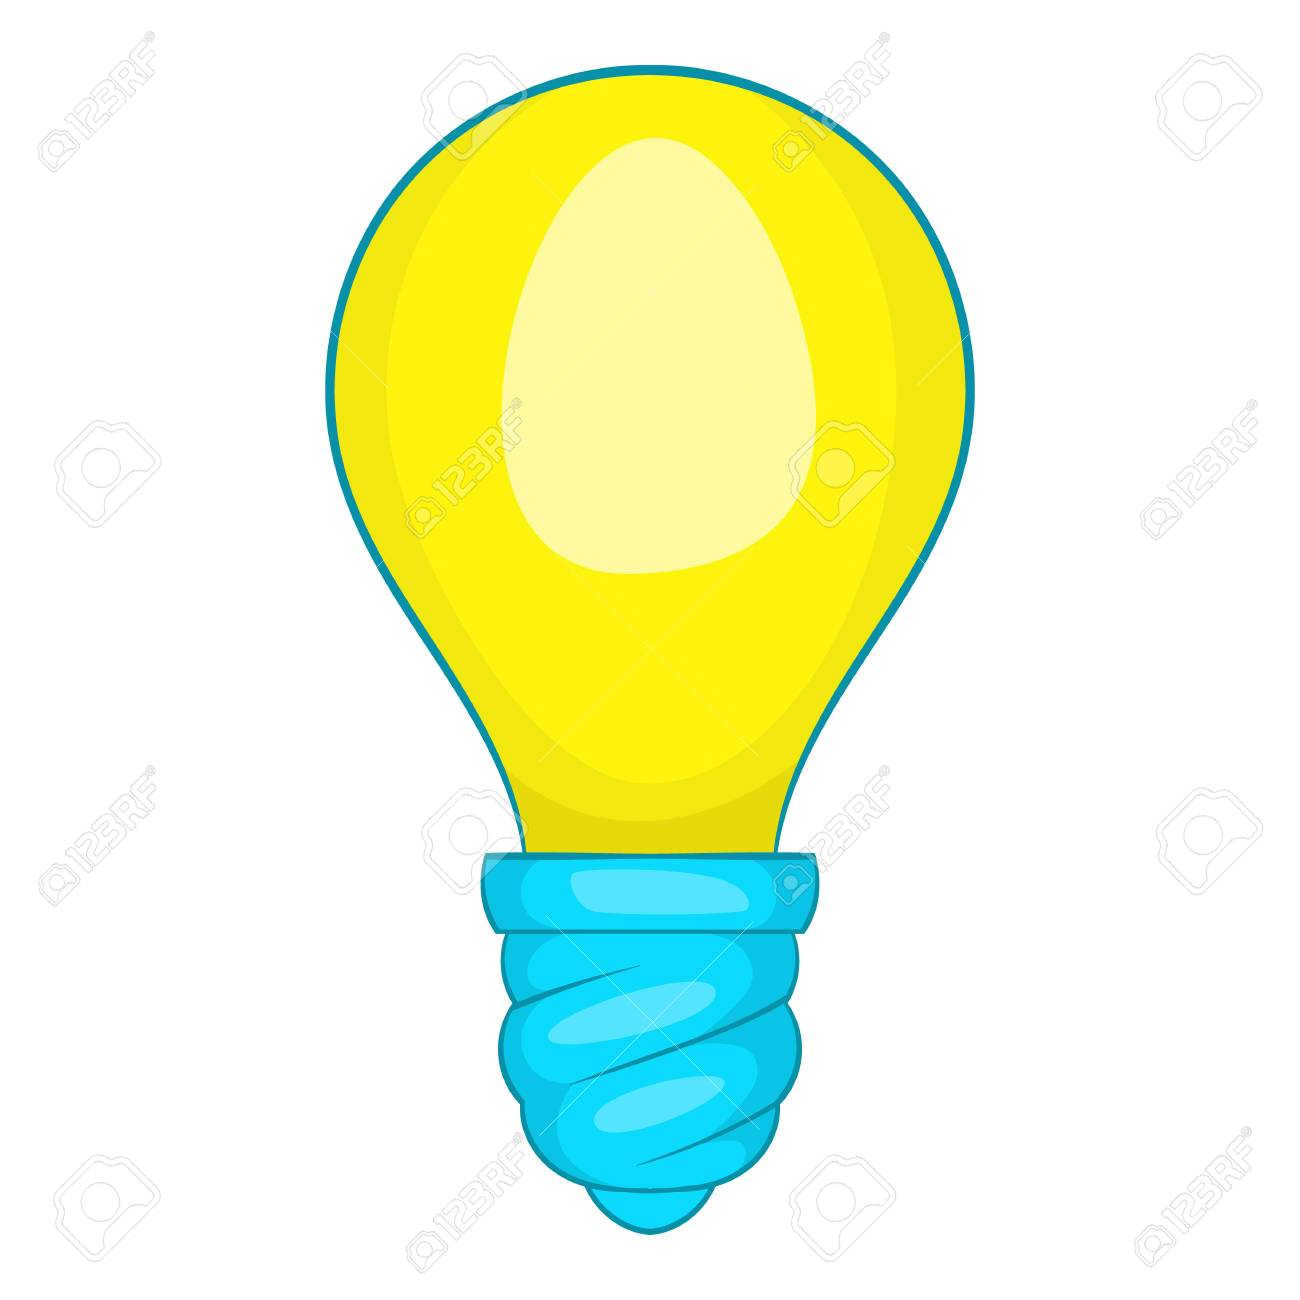 lamp bulb icon cartoon illustration of lamp vector icon for rh 123rf com lamb vector image lamp vector free